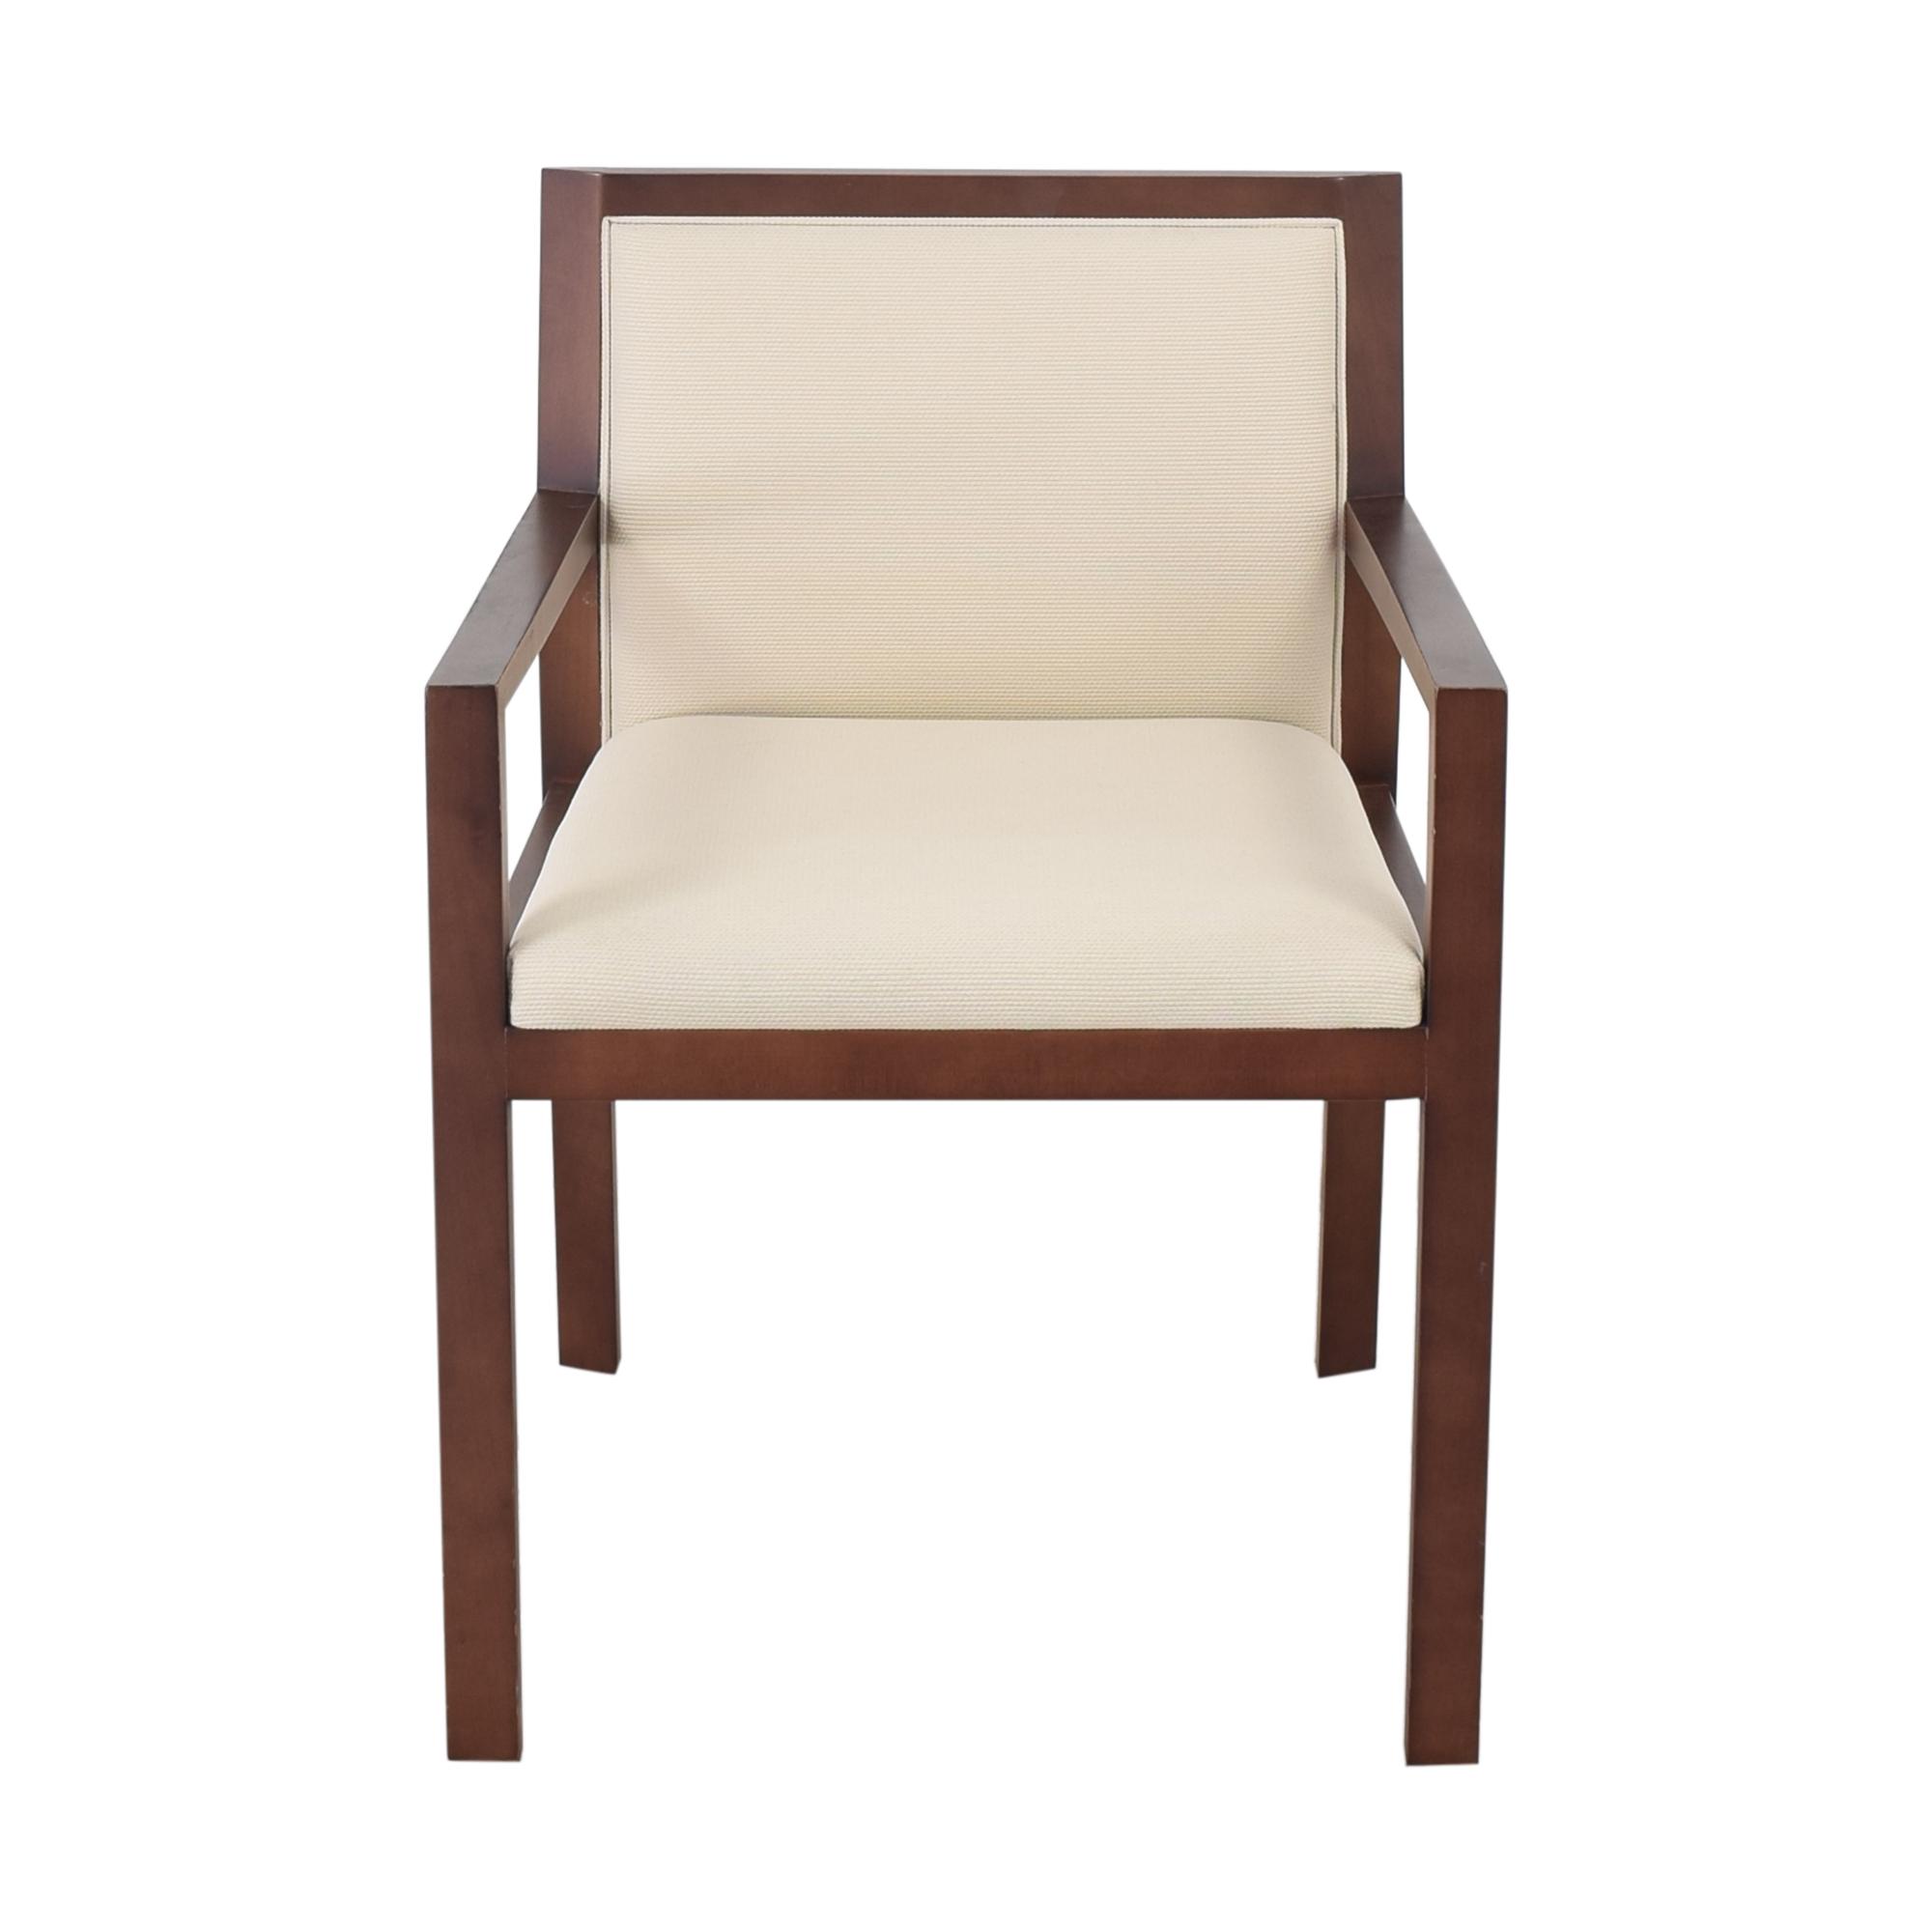 Bernhardt Bernhardt Fabric Desk Chair on sale